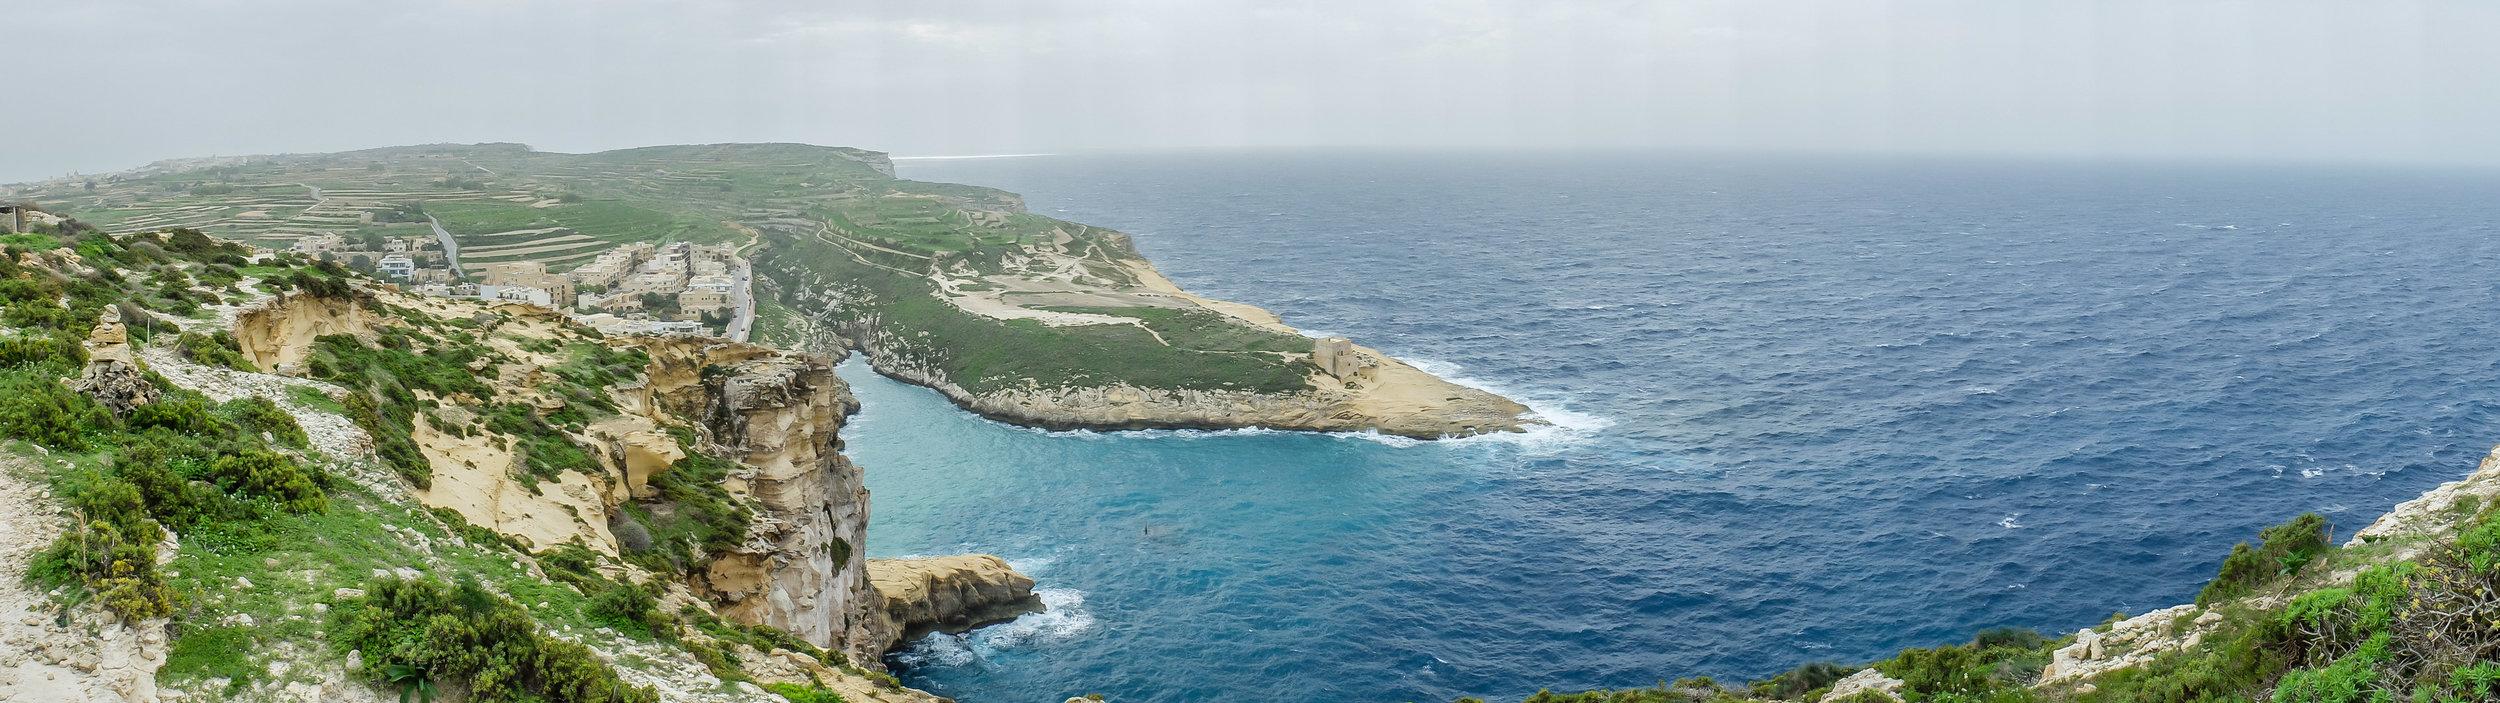 malta-travel-31.jpg